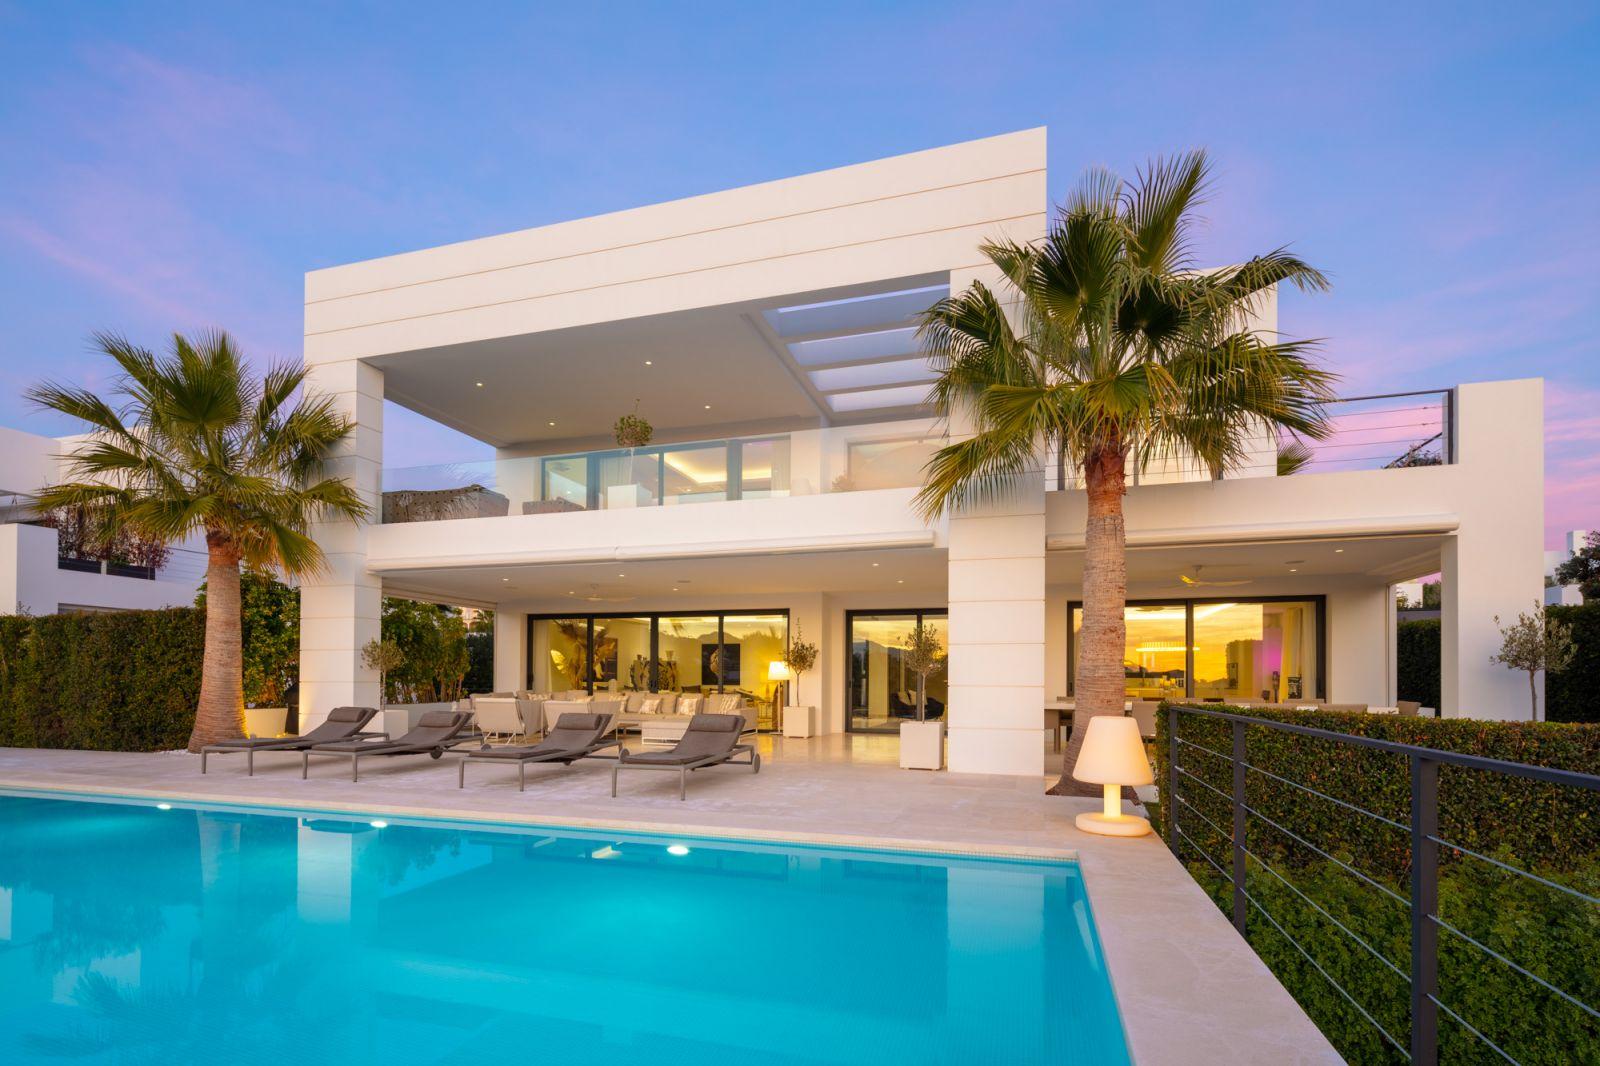 Long Term Rentals Marbella - Your Move Spain